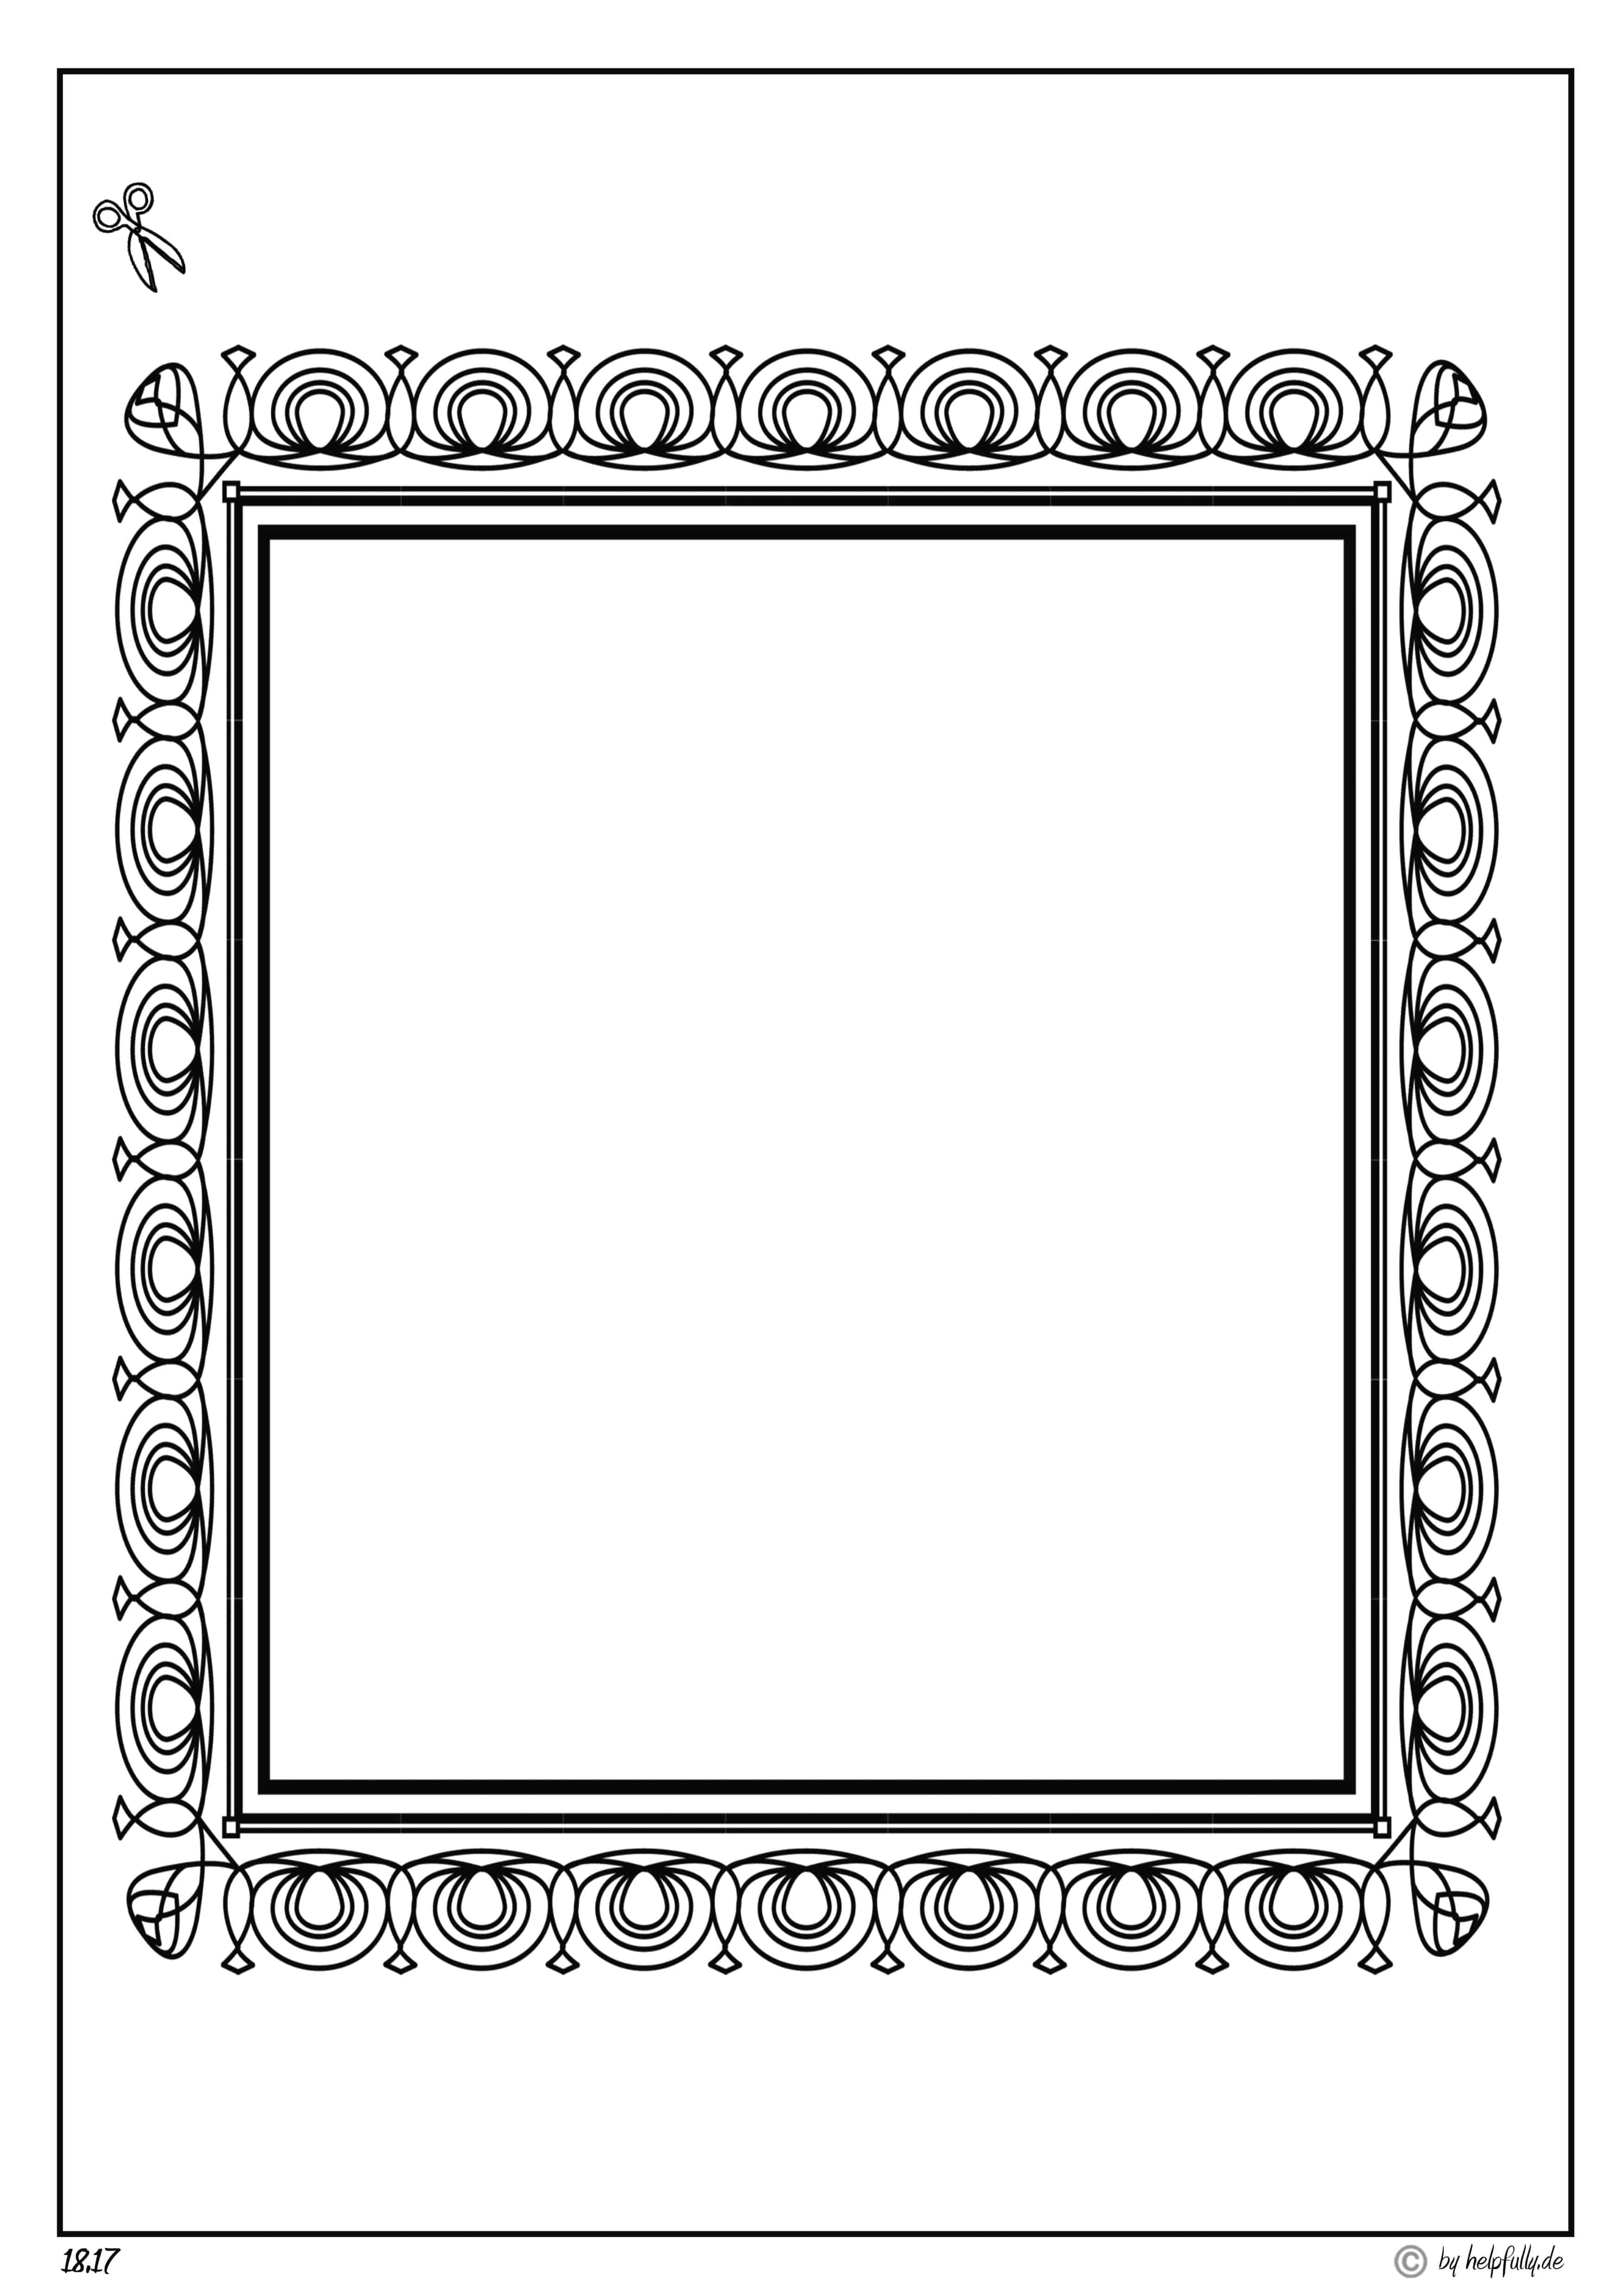 Papiervorlage Rahmen Sw Ii